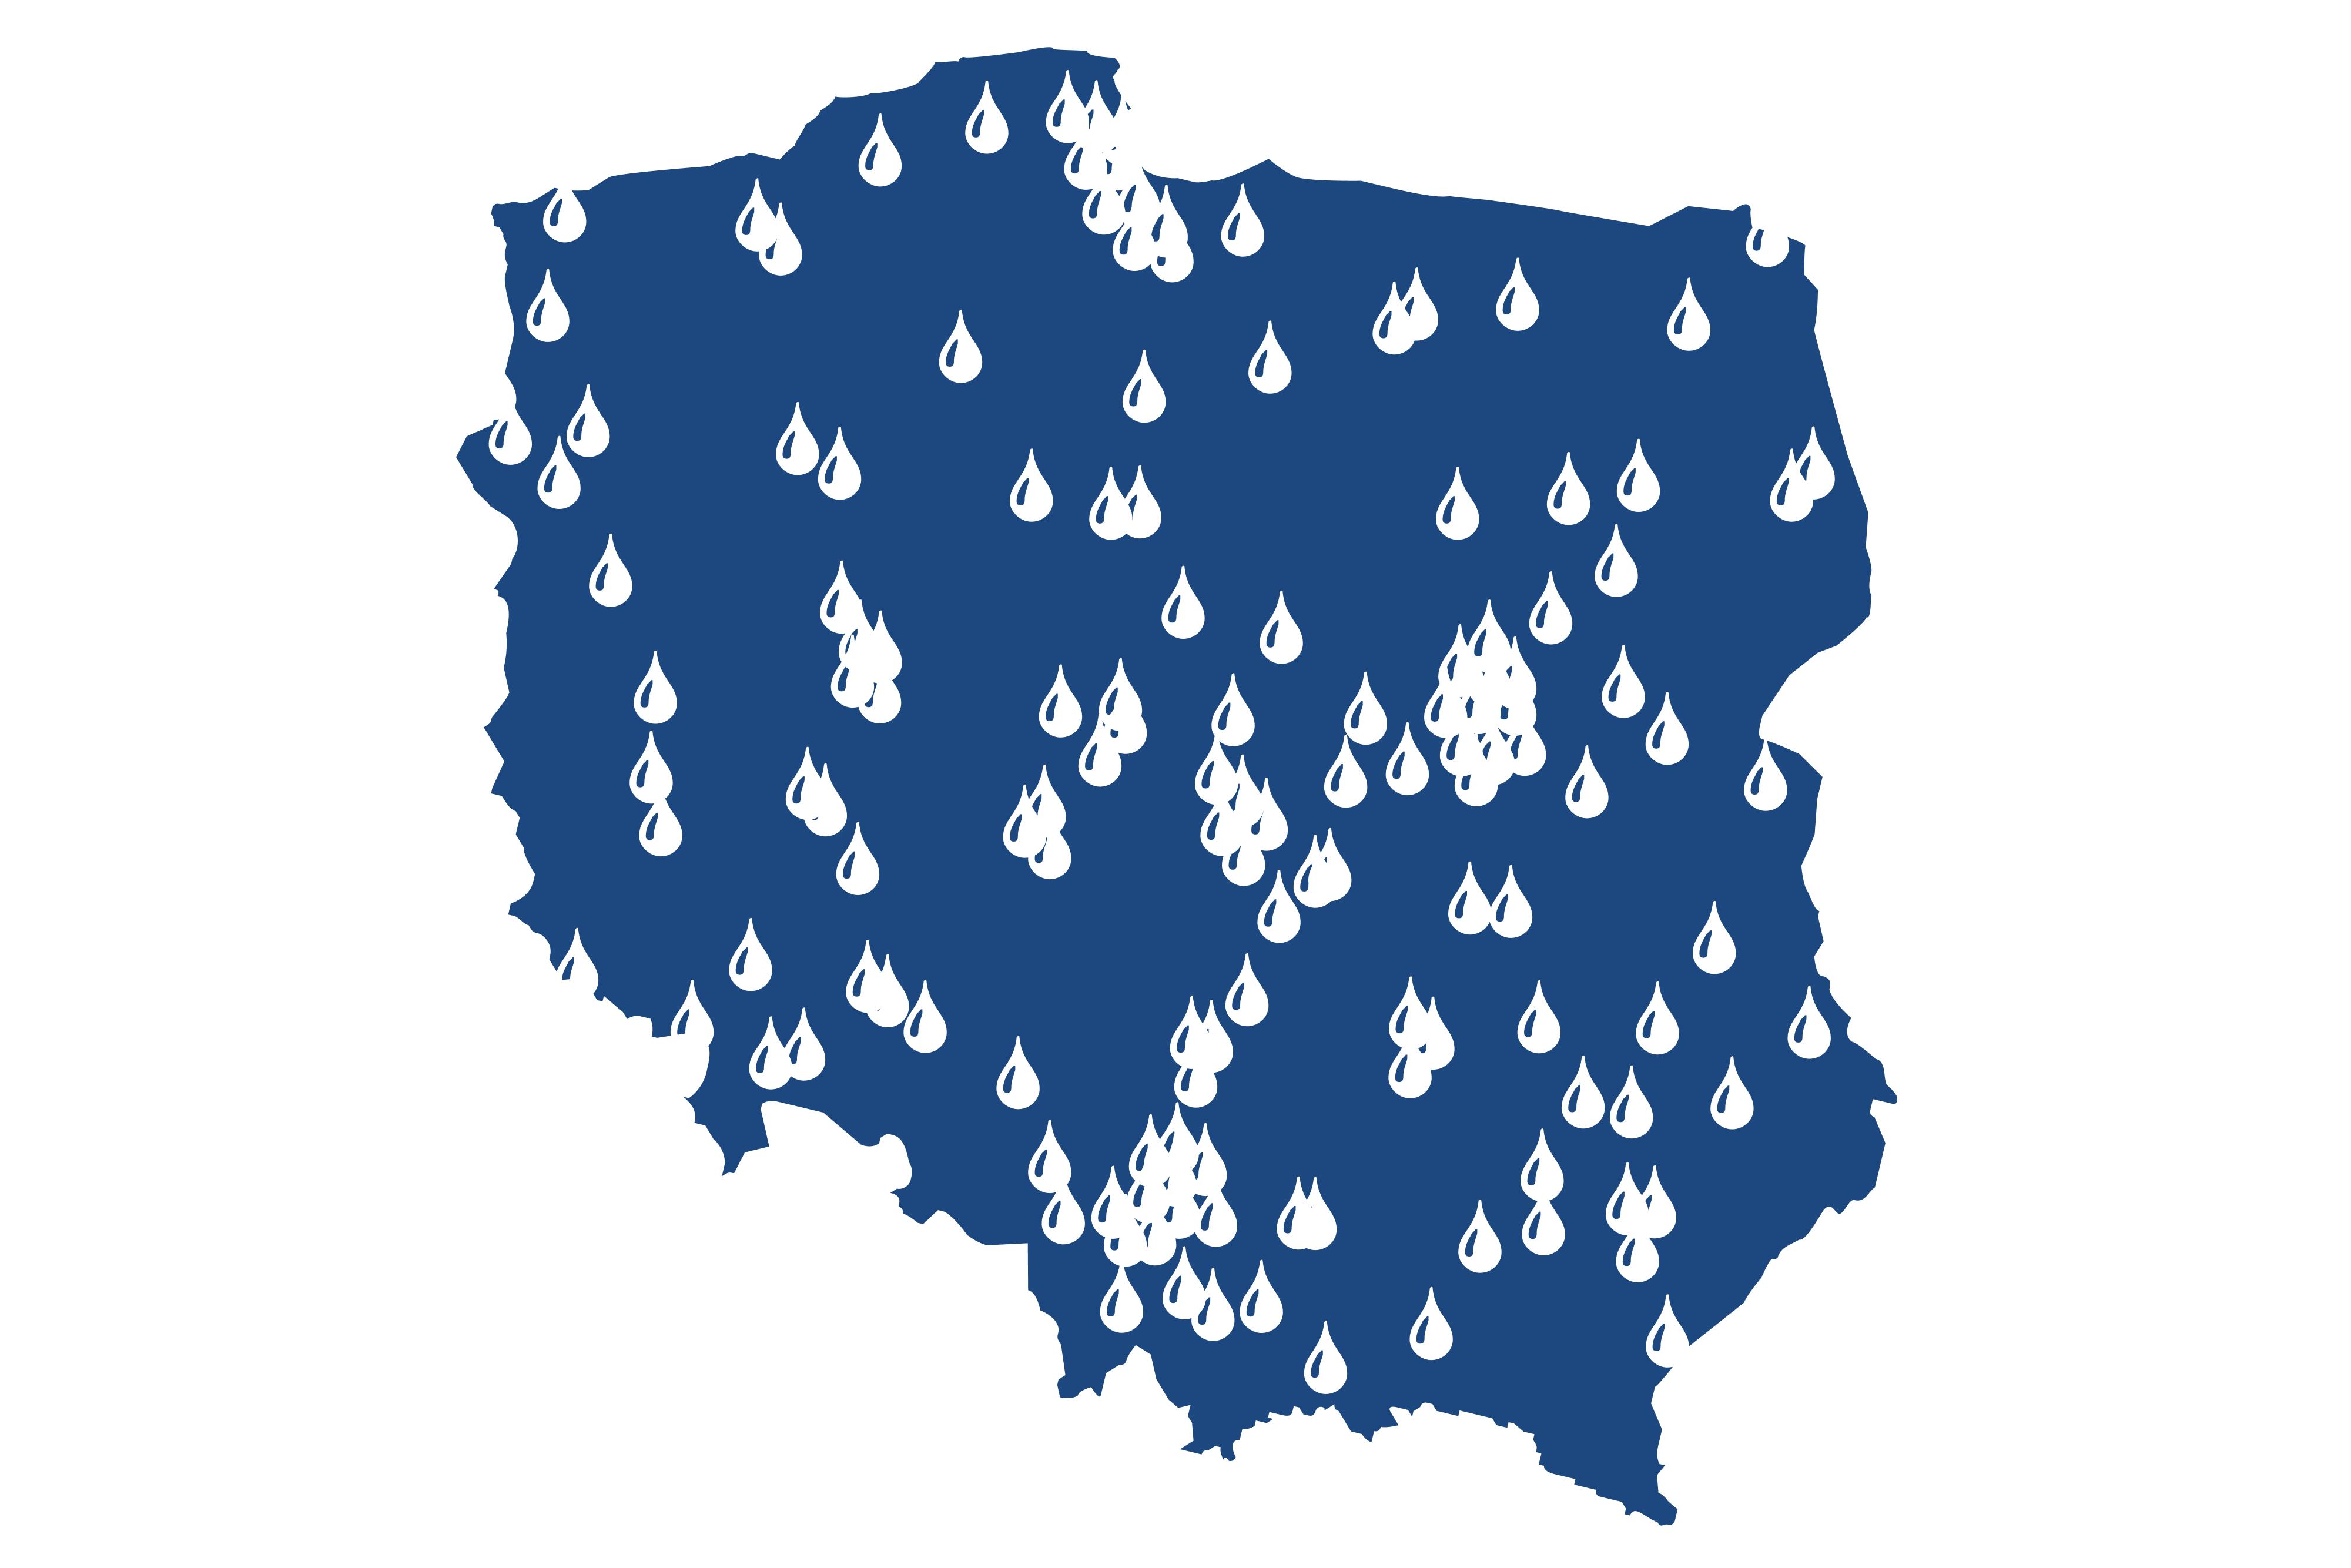 https://www.multiwash.pl/wp-content/uploads/2020/04/mapa_polski.png